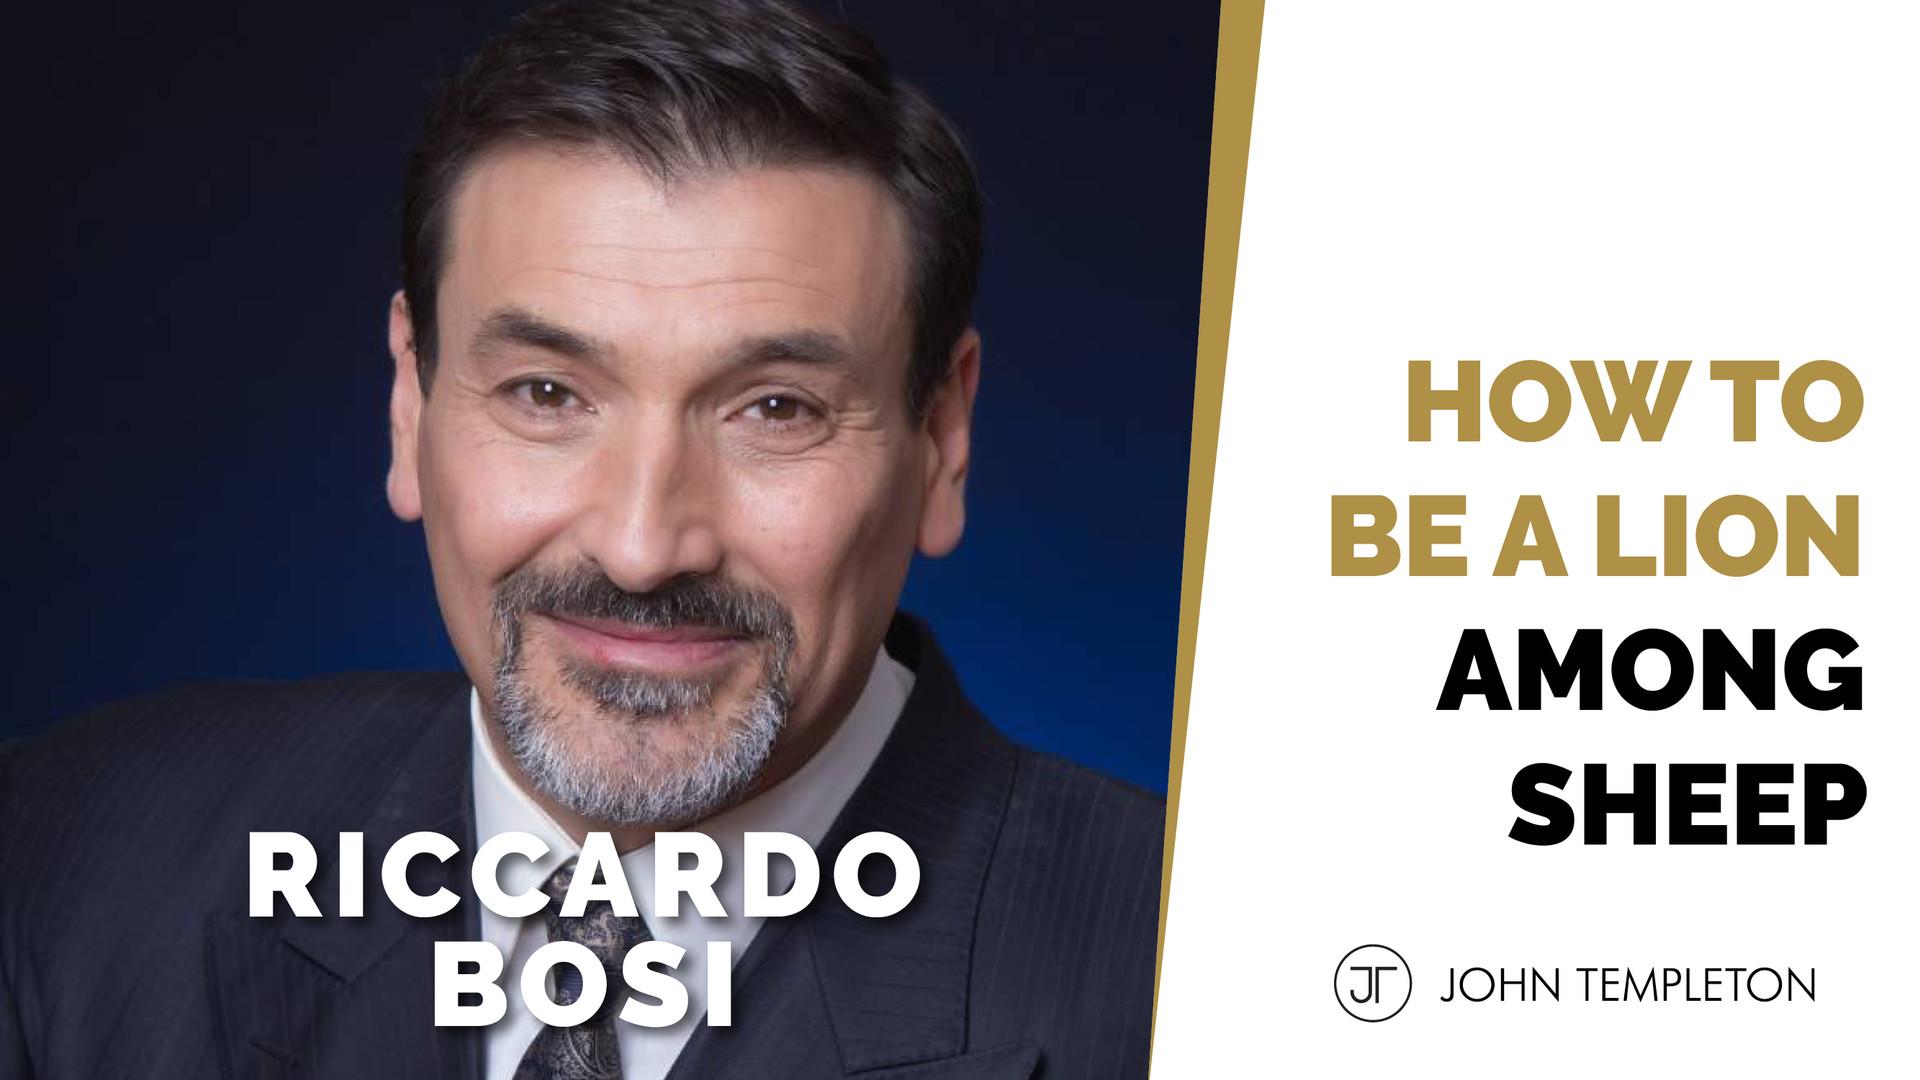 RICCARDO BOSI